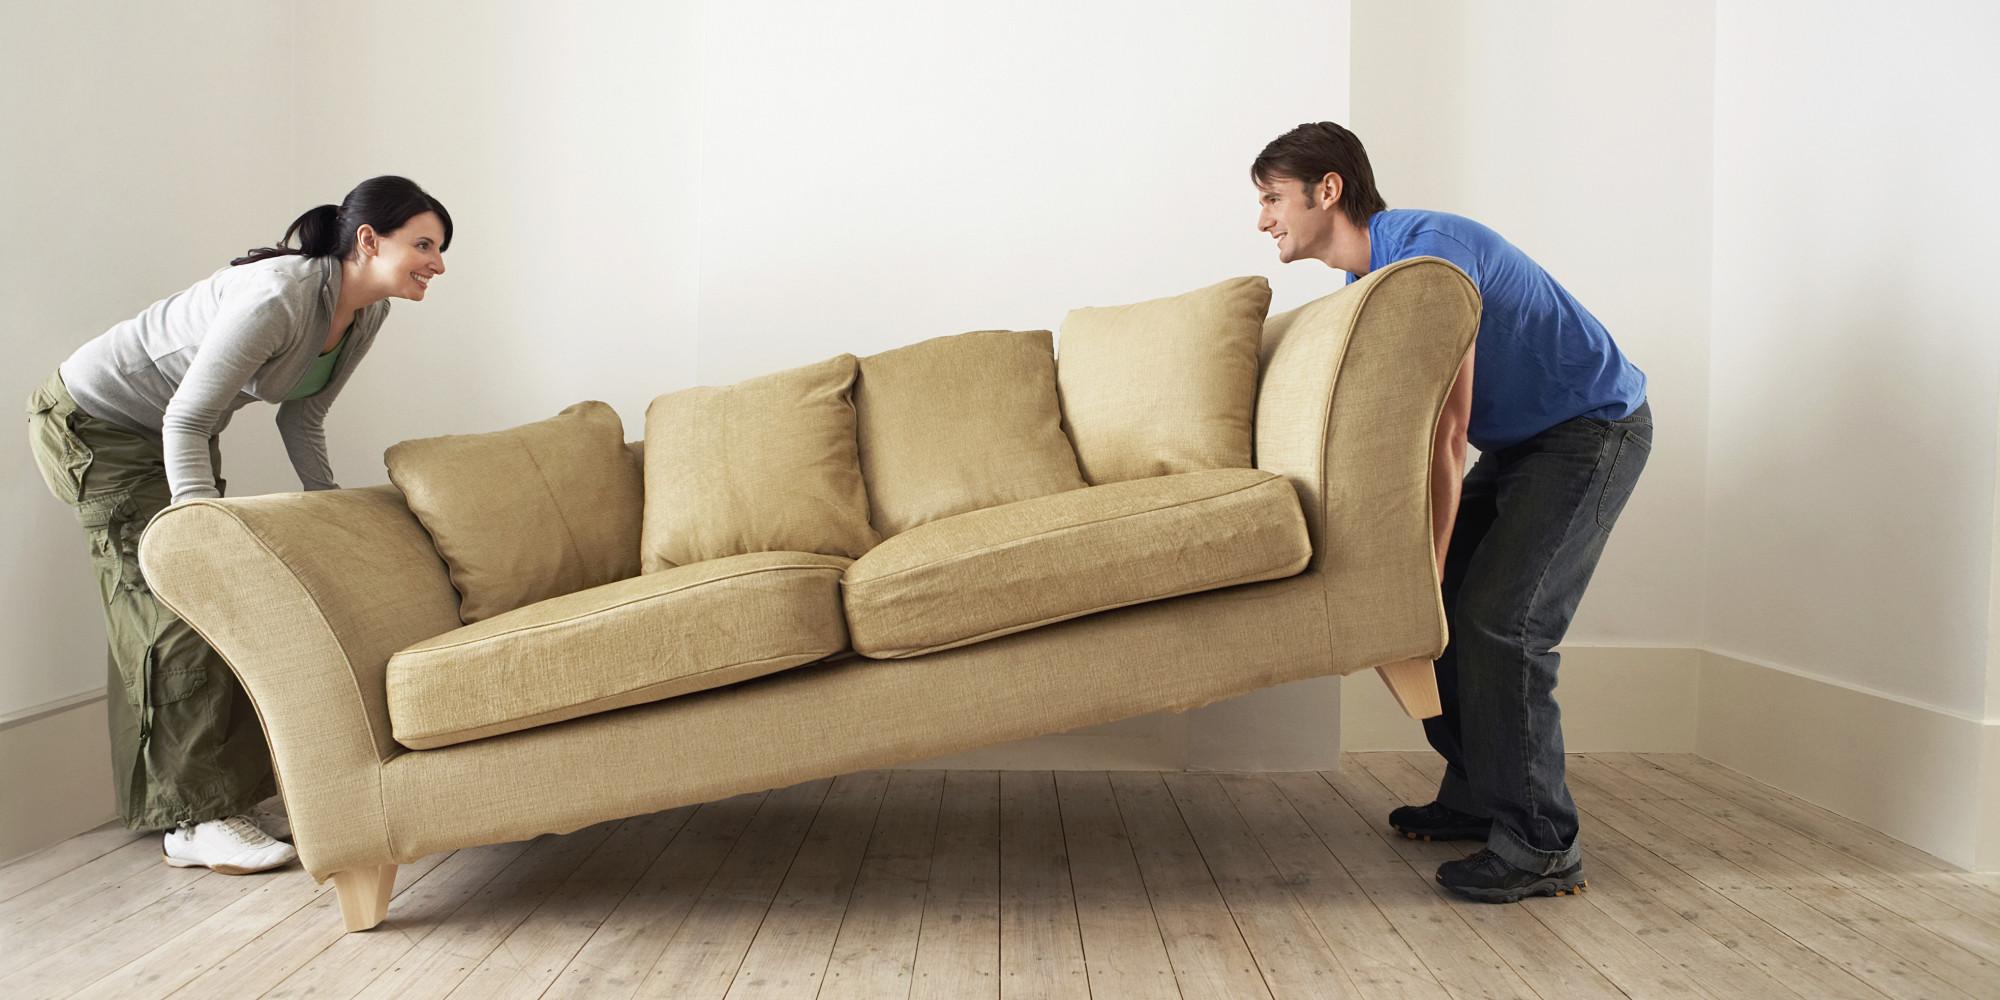 Image result for furniture rearranging images